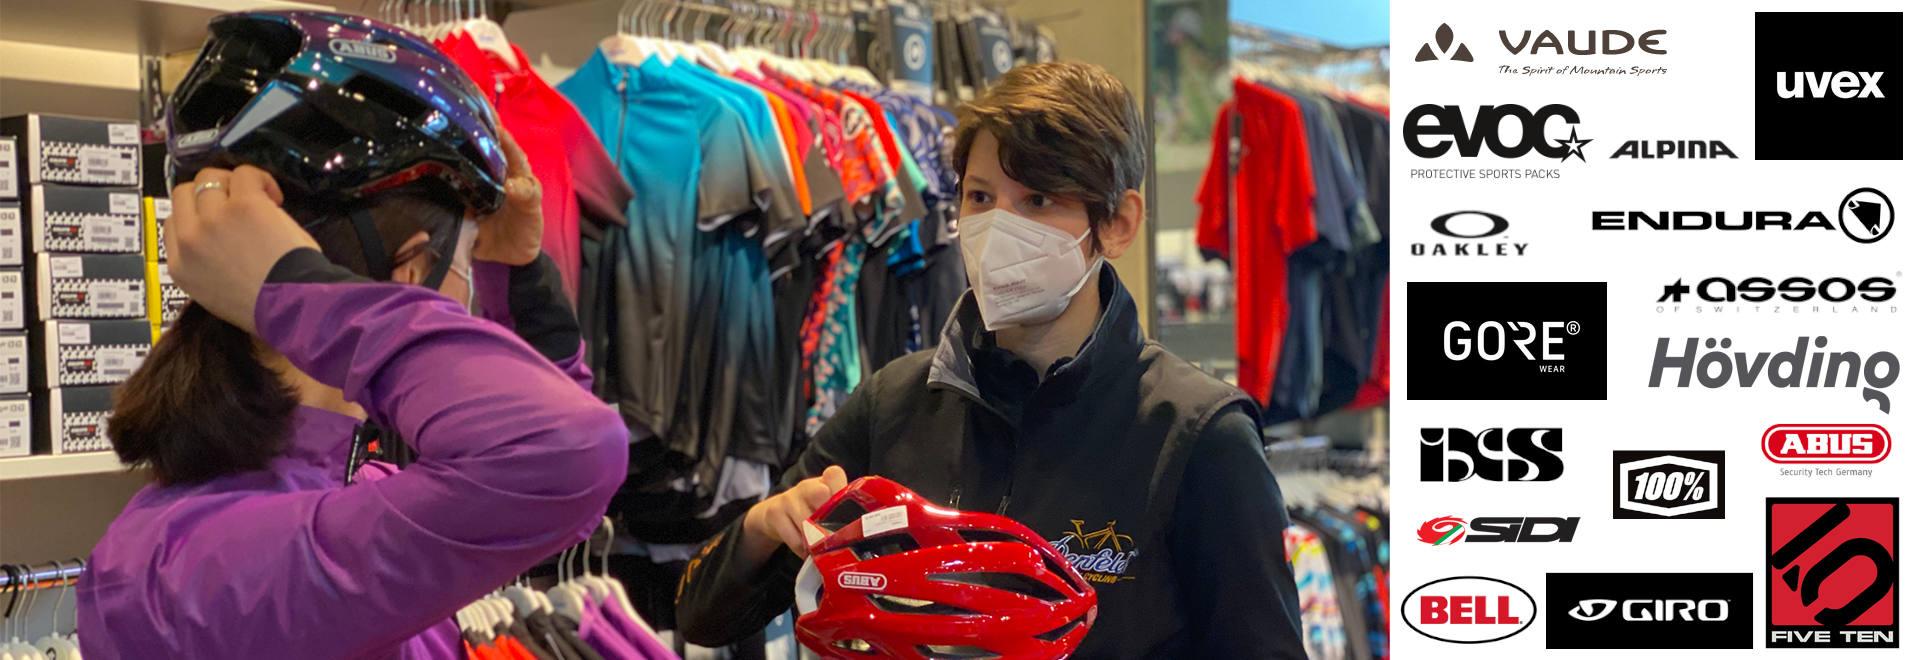 Fahrradbekleidung: Top Markenauswahl bei Denfeld